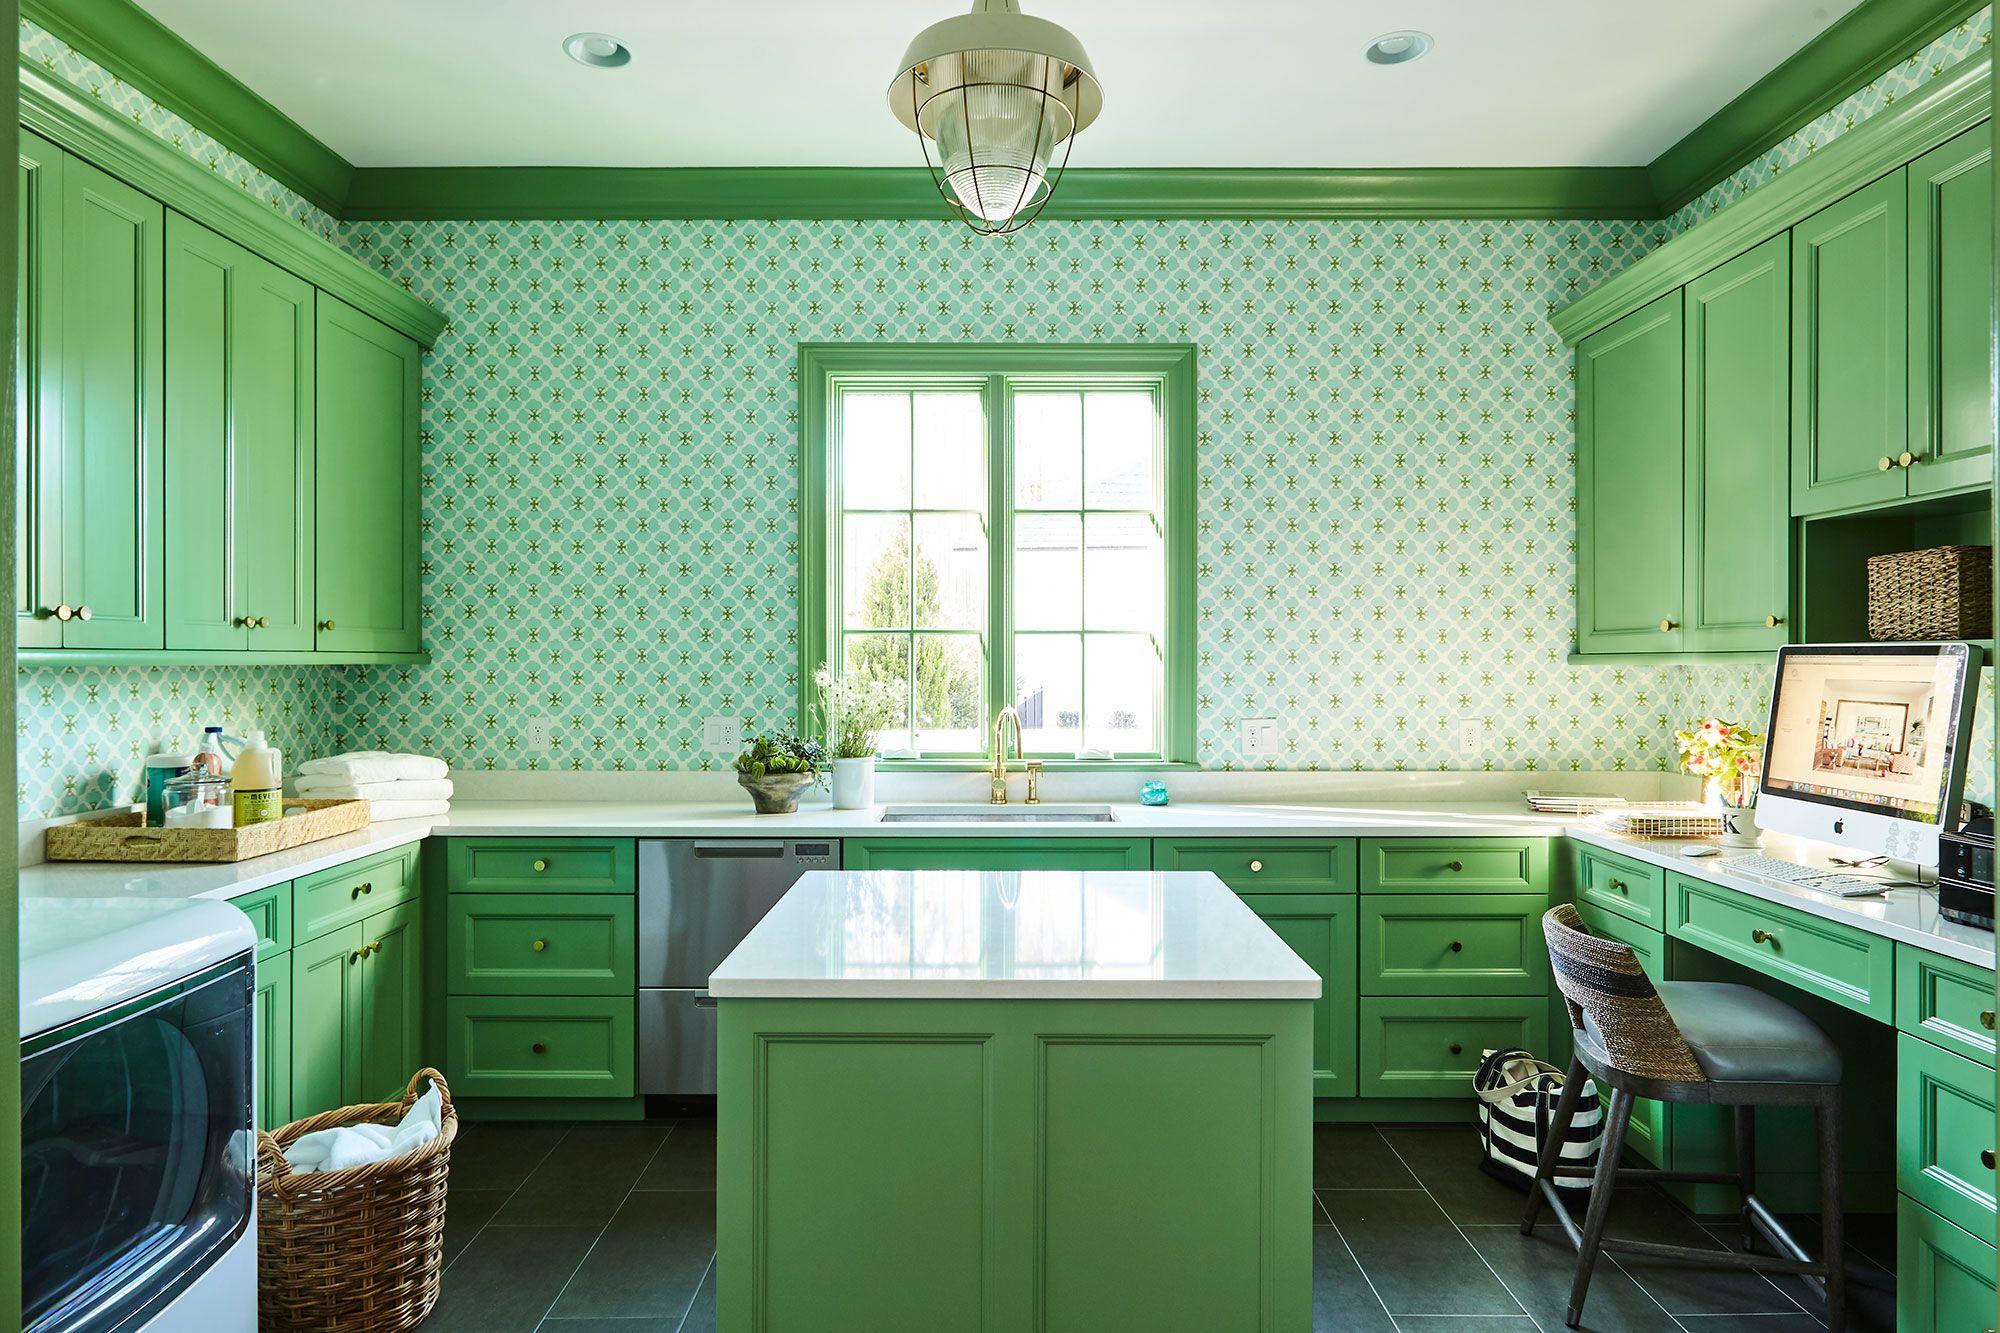 green laundry room homedecor interiordesign